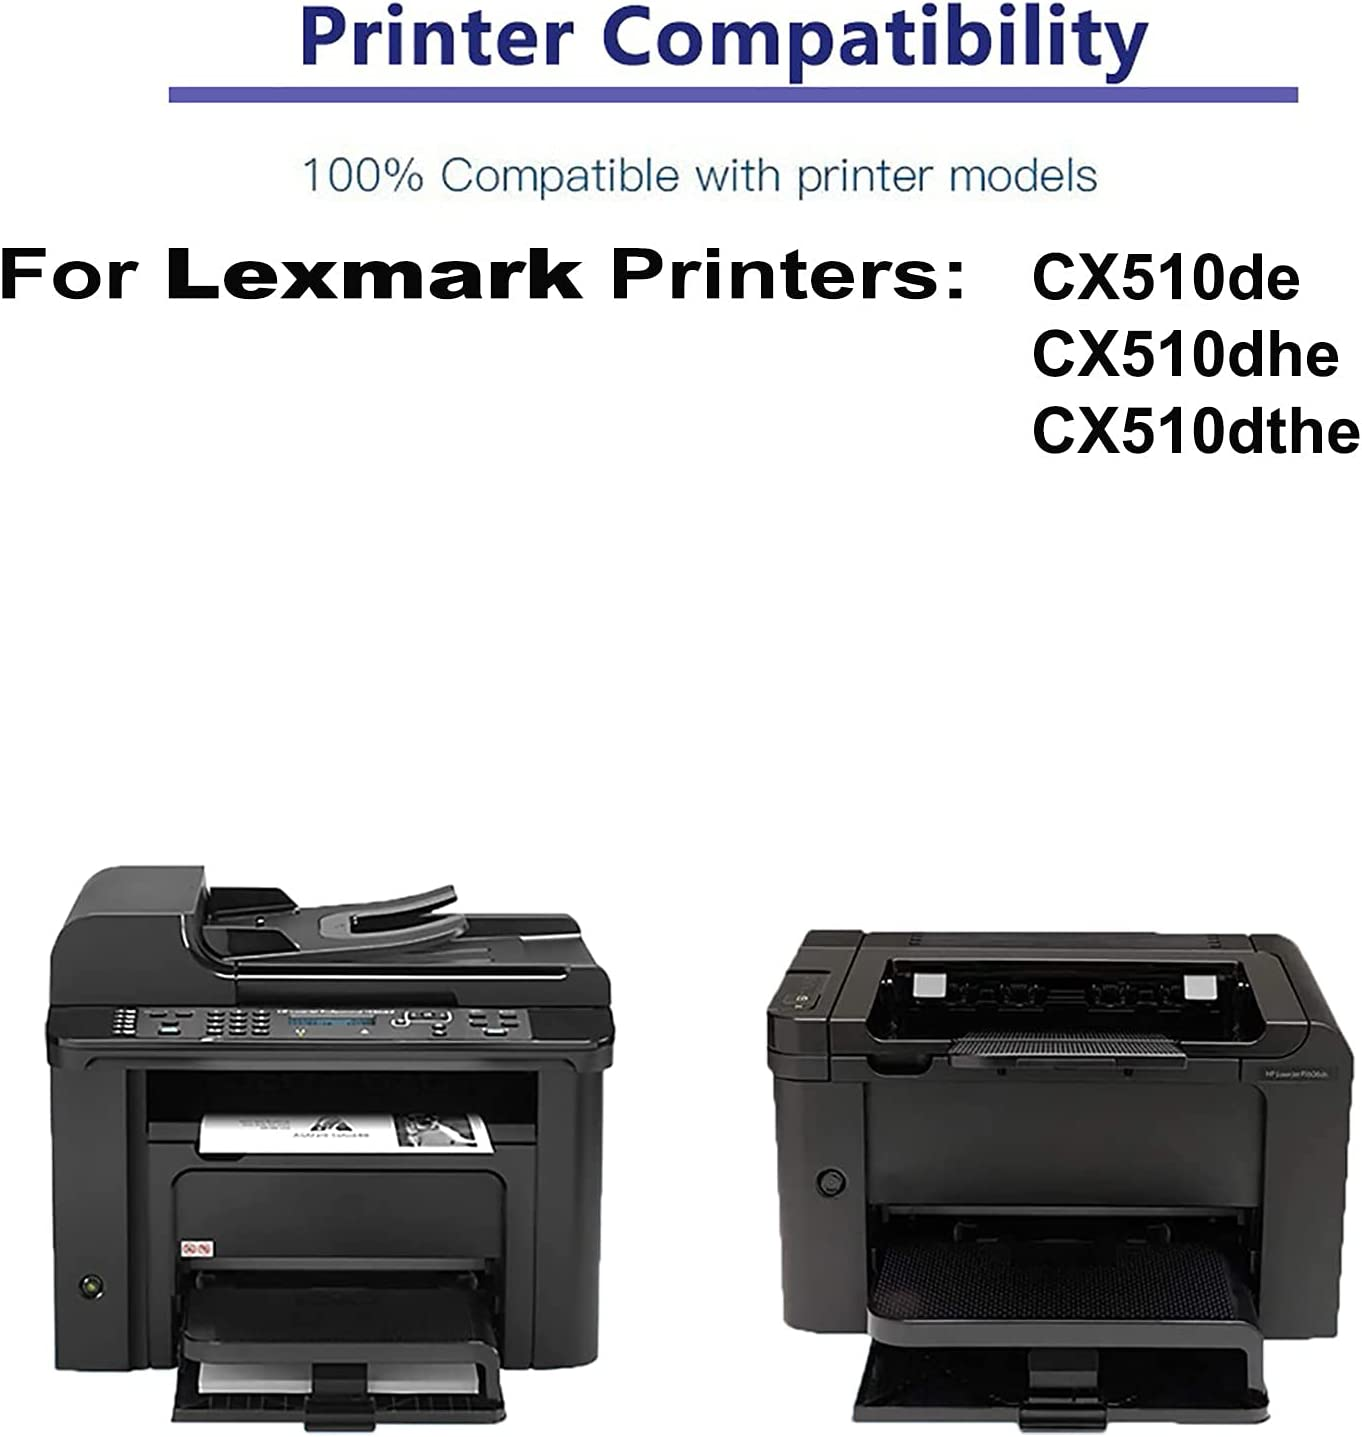 2-Pack (Magenta) Compatible CX510de, CX510dhe, CX510dthe Printer Toner Cartridge High Capacity Replacement for Lexmark 80C0XMG Toner Cartridge